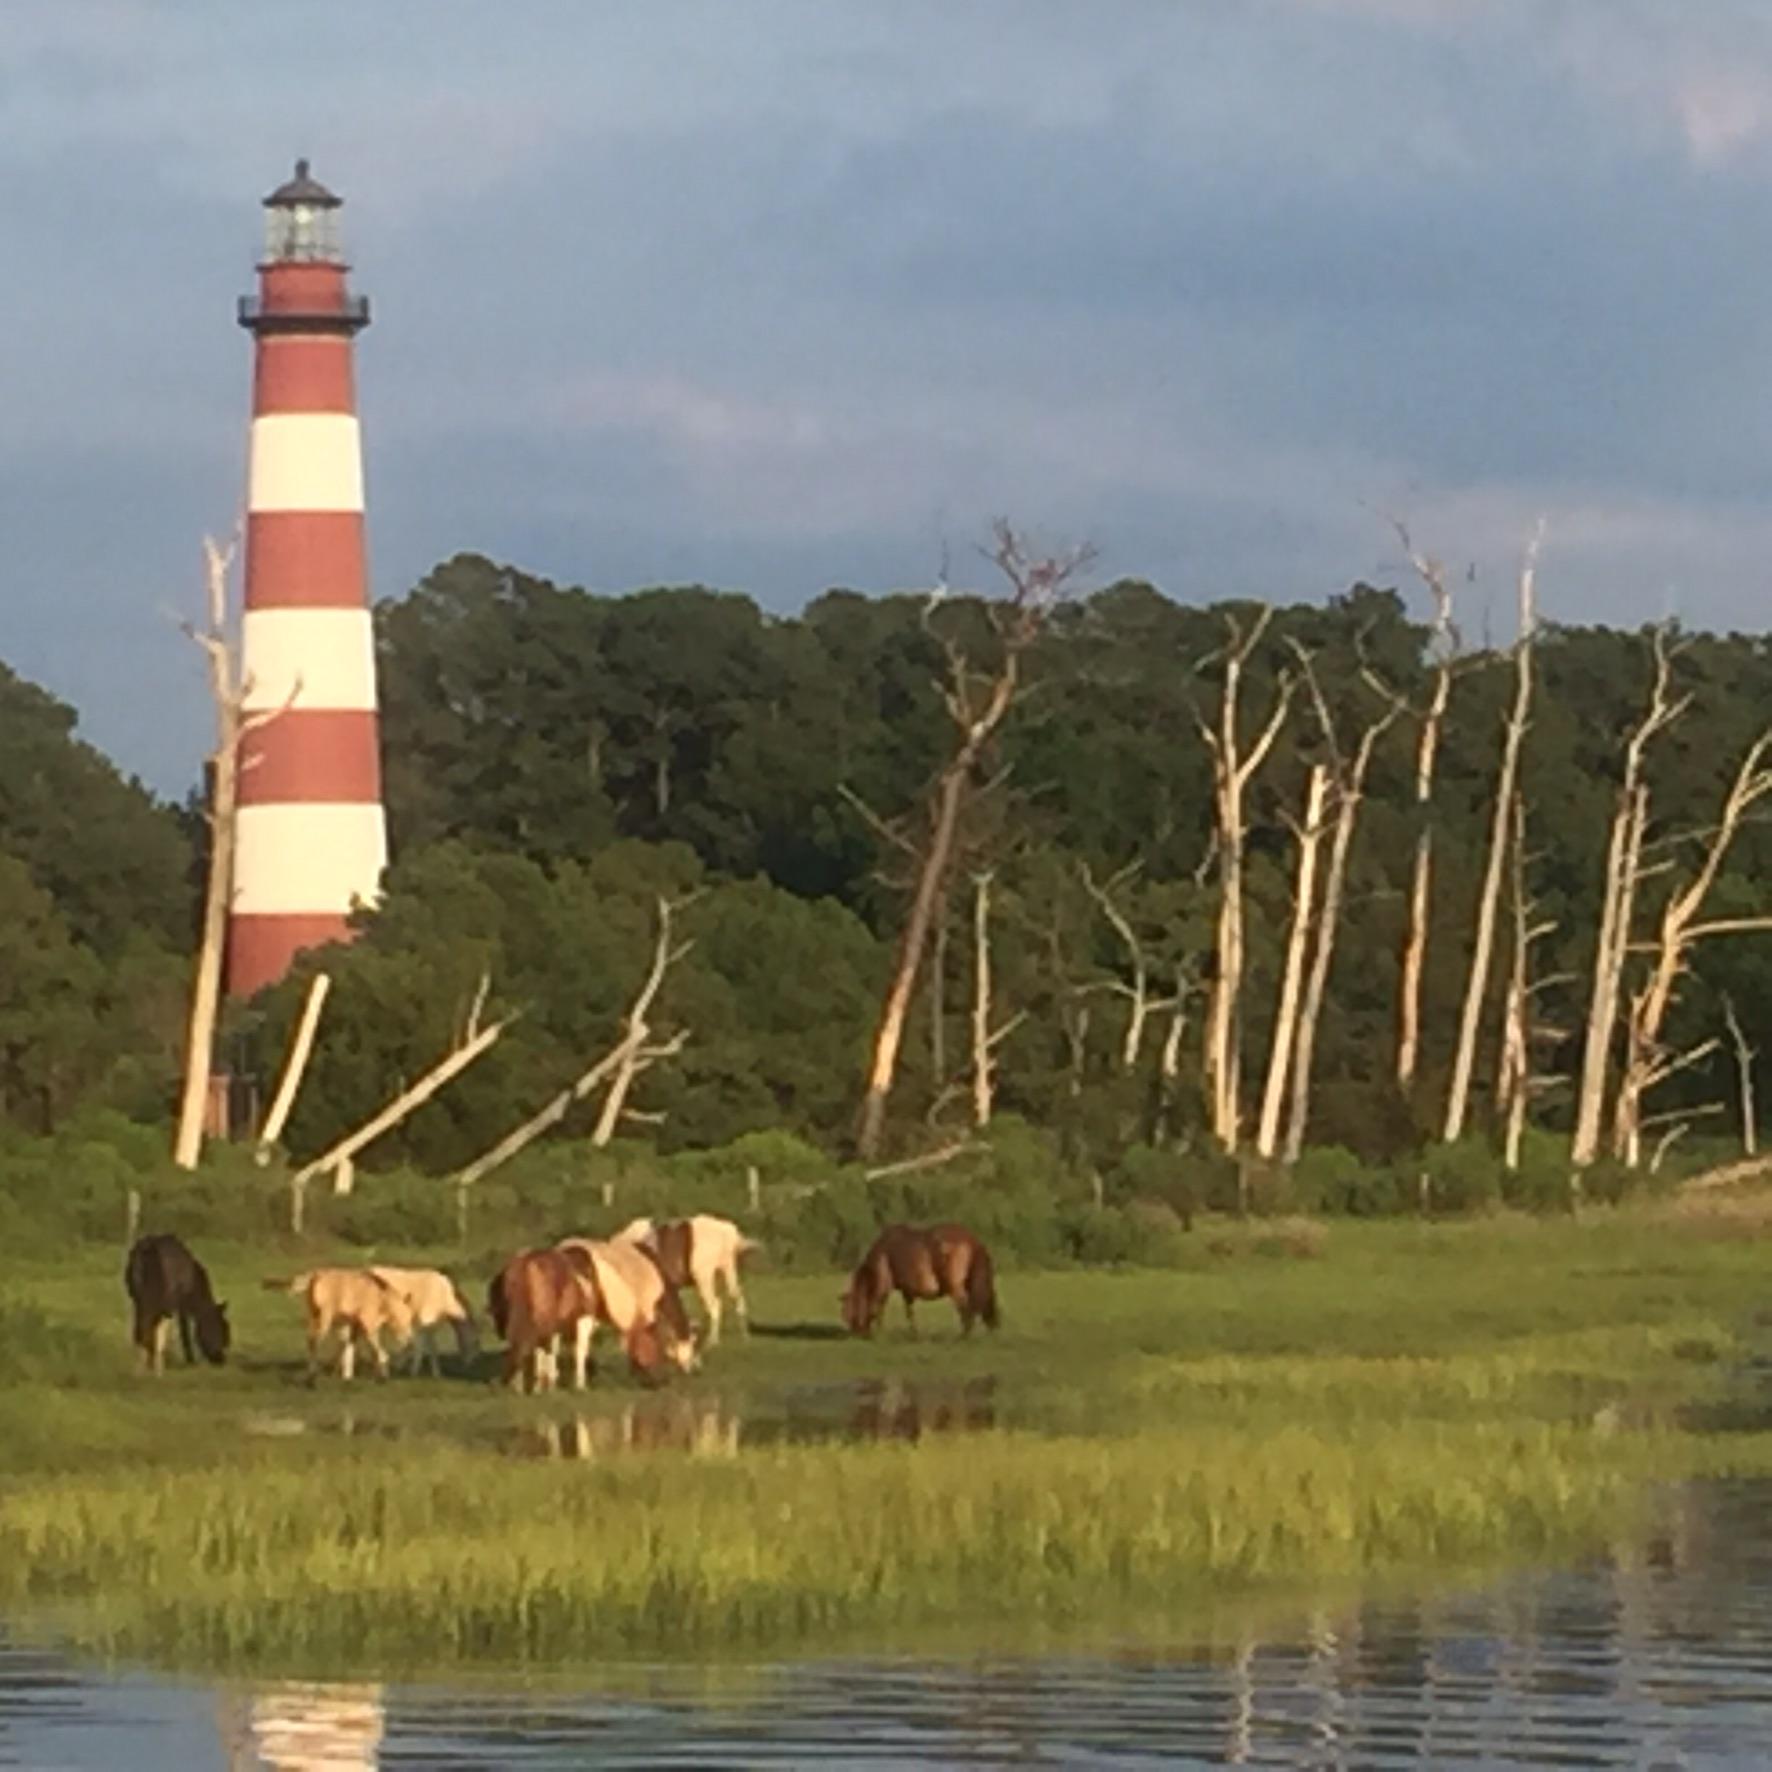 Chincoteague Wild Ponies, Assateague Island Snow Hill, VA